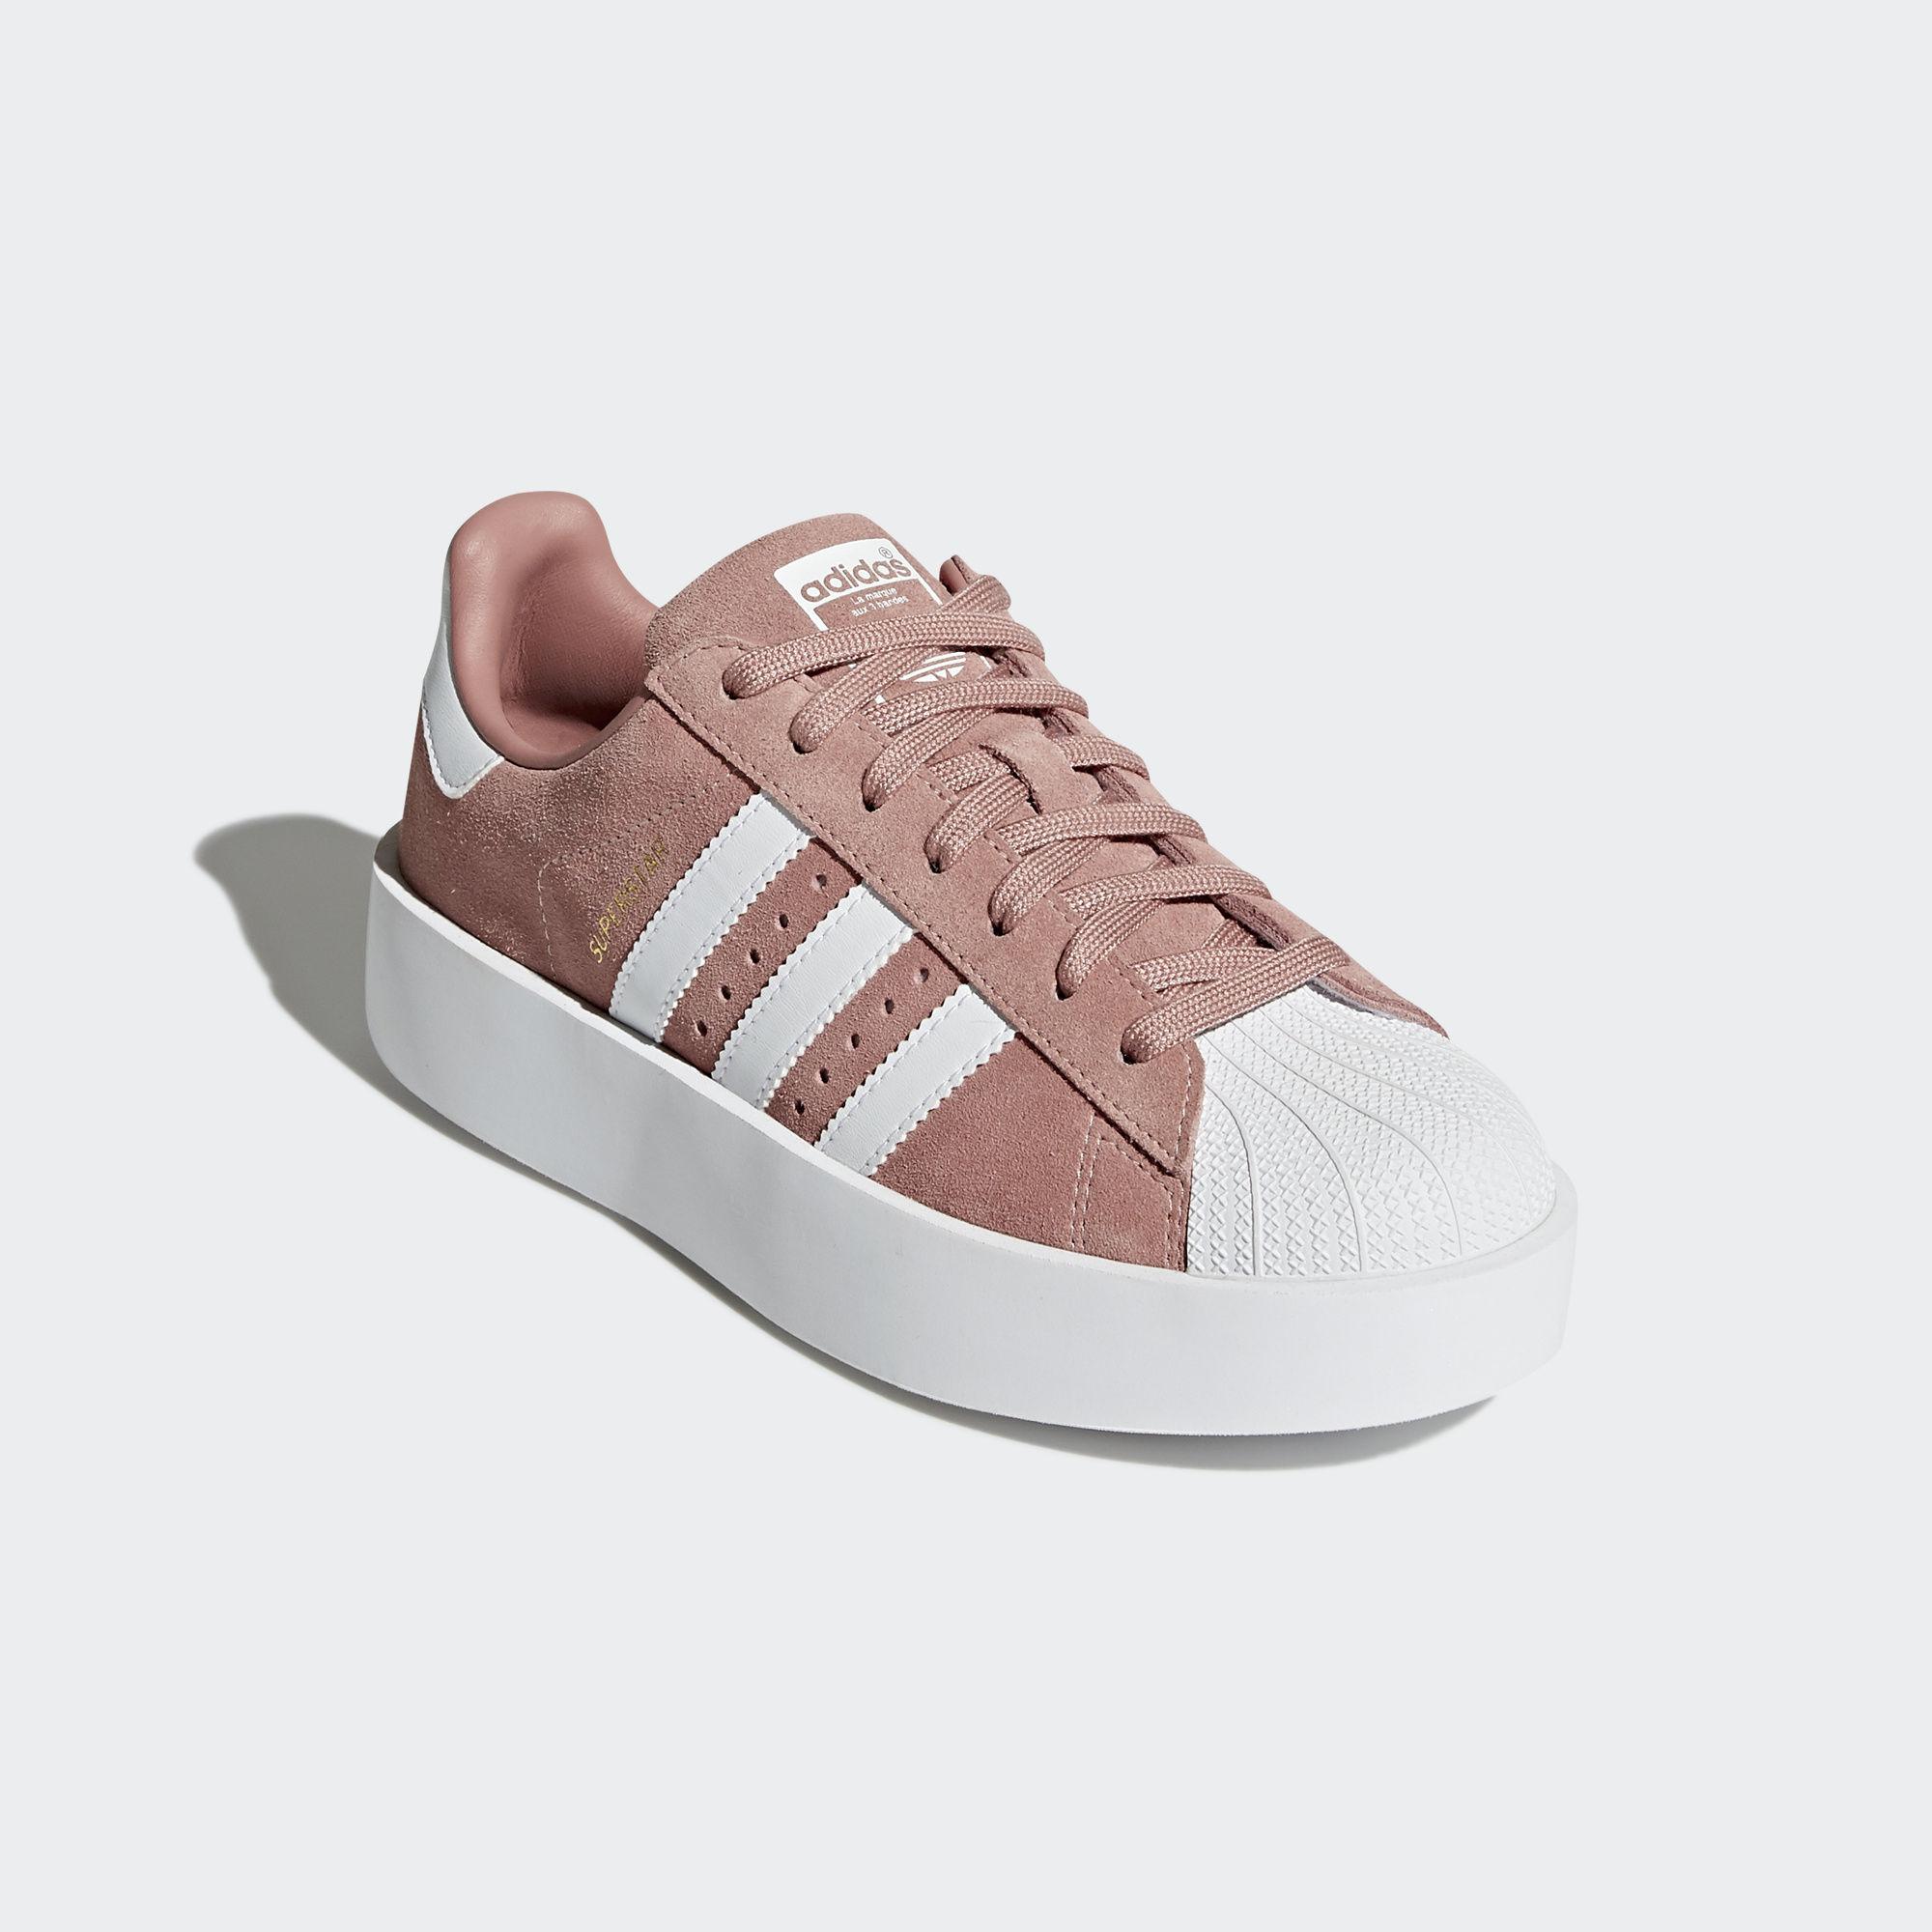 cbb73838cf8693 SPEDIZIONE GRATUITA Adidas Superstar Bold Platform Camoscio Rosa Antico  Art. CQ2827. Cq2827 01 standard · Cq2827 04 standard ...